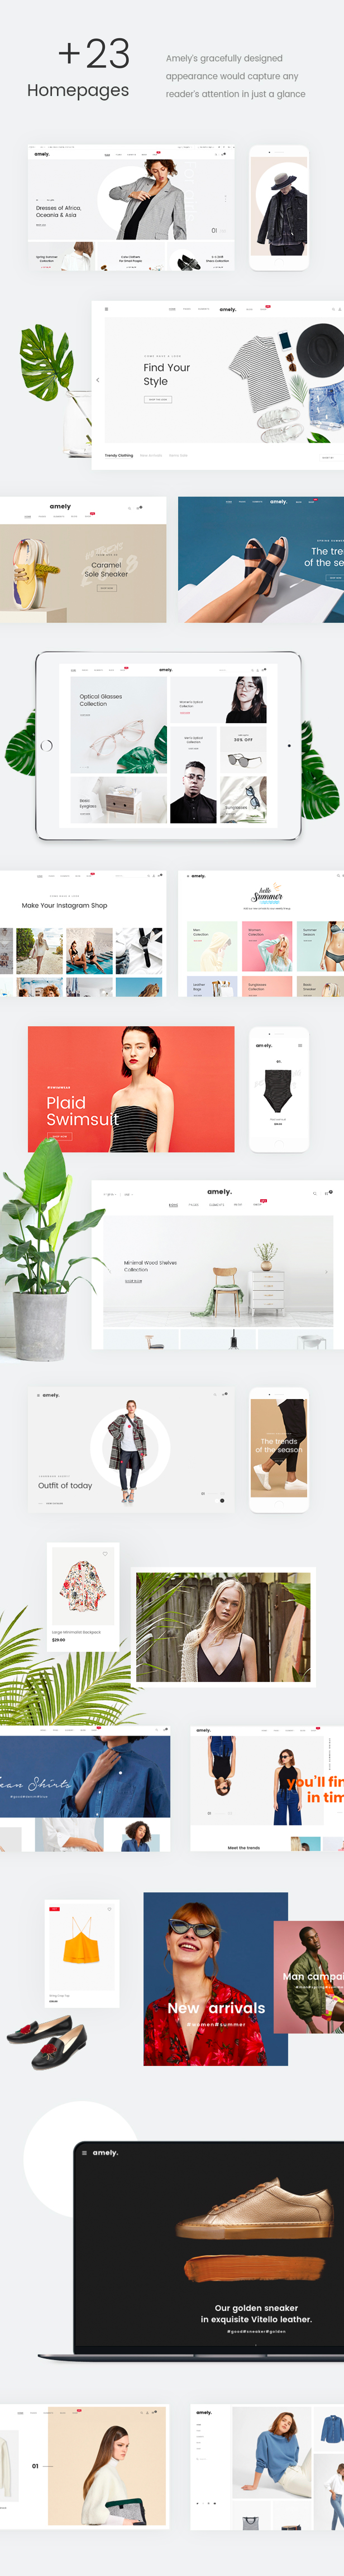 Fashion WooCommerce WordPress Theme - 18+ Homepages